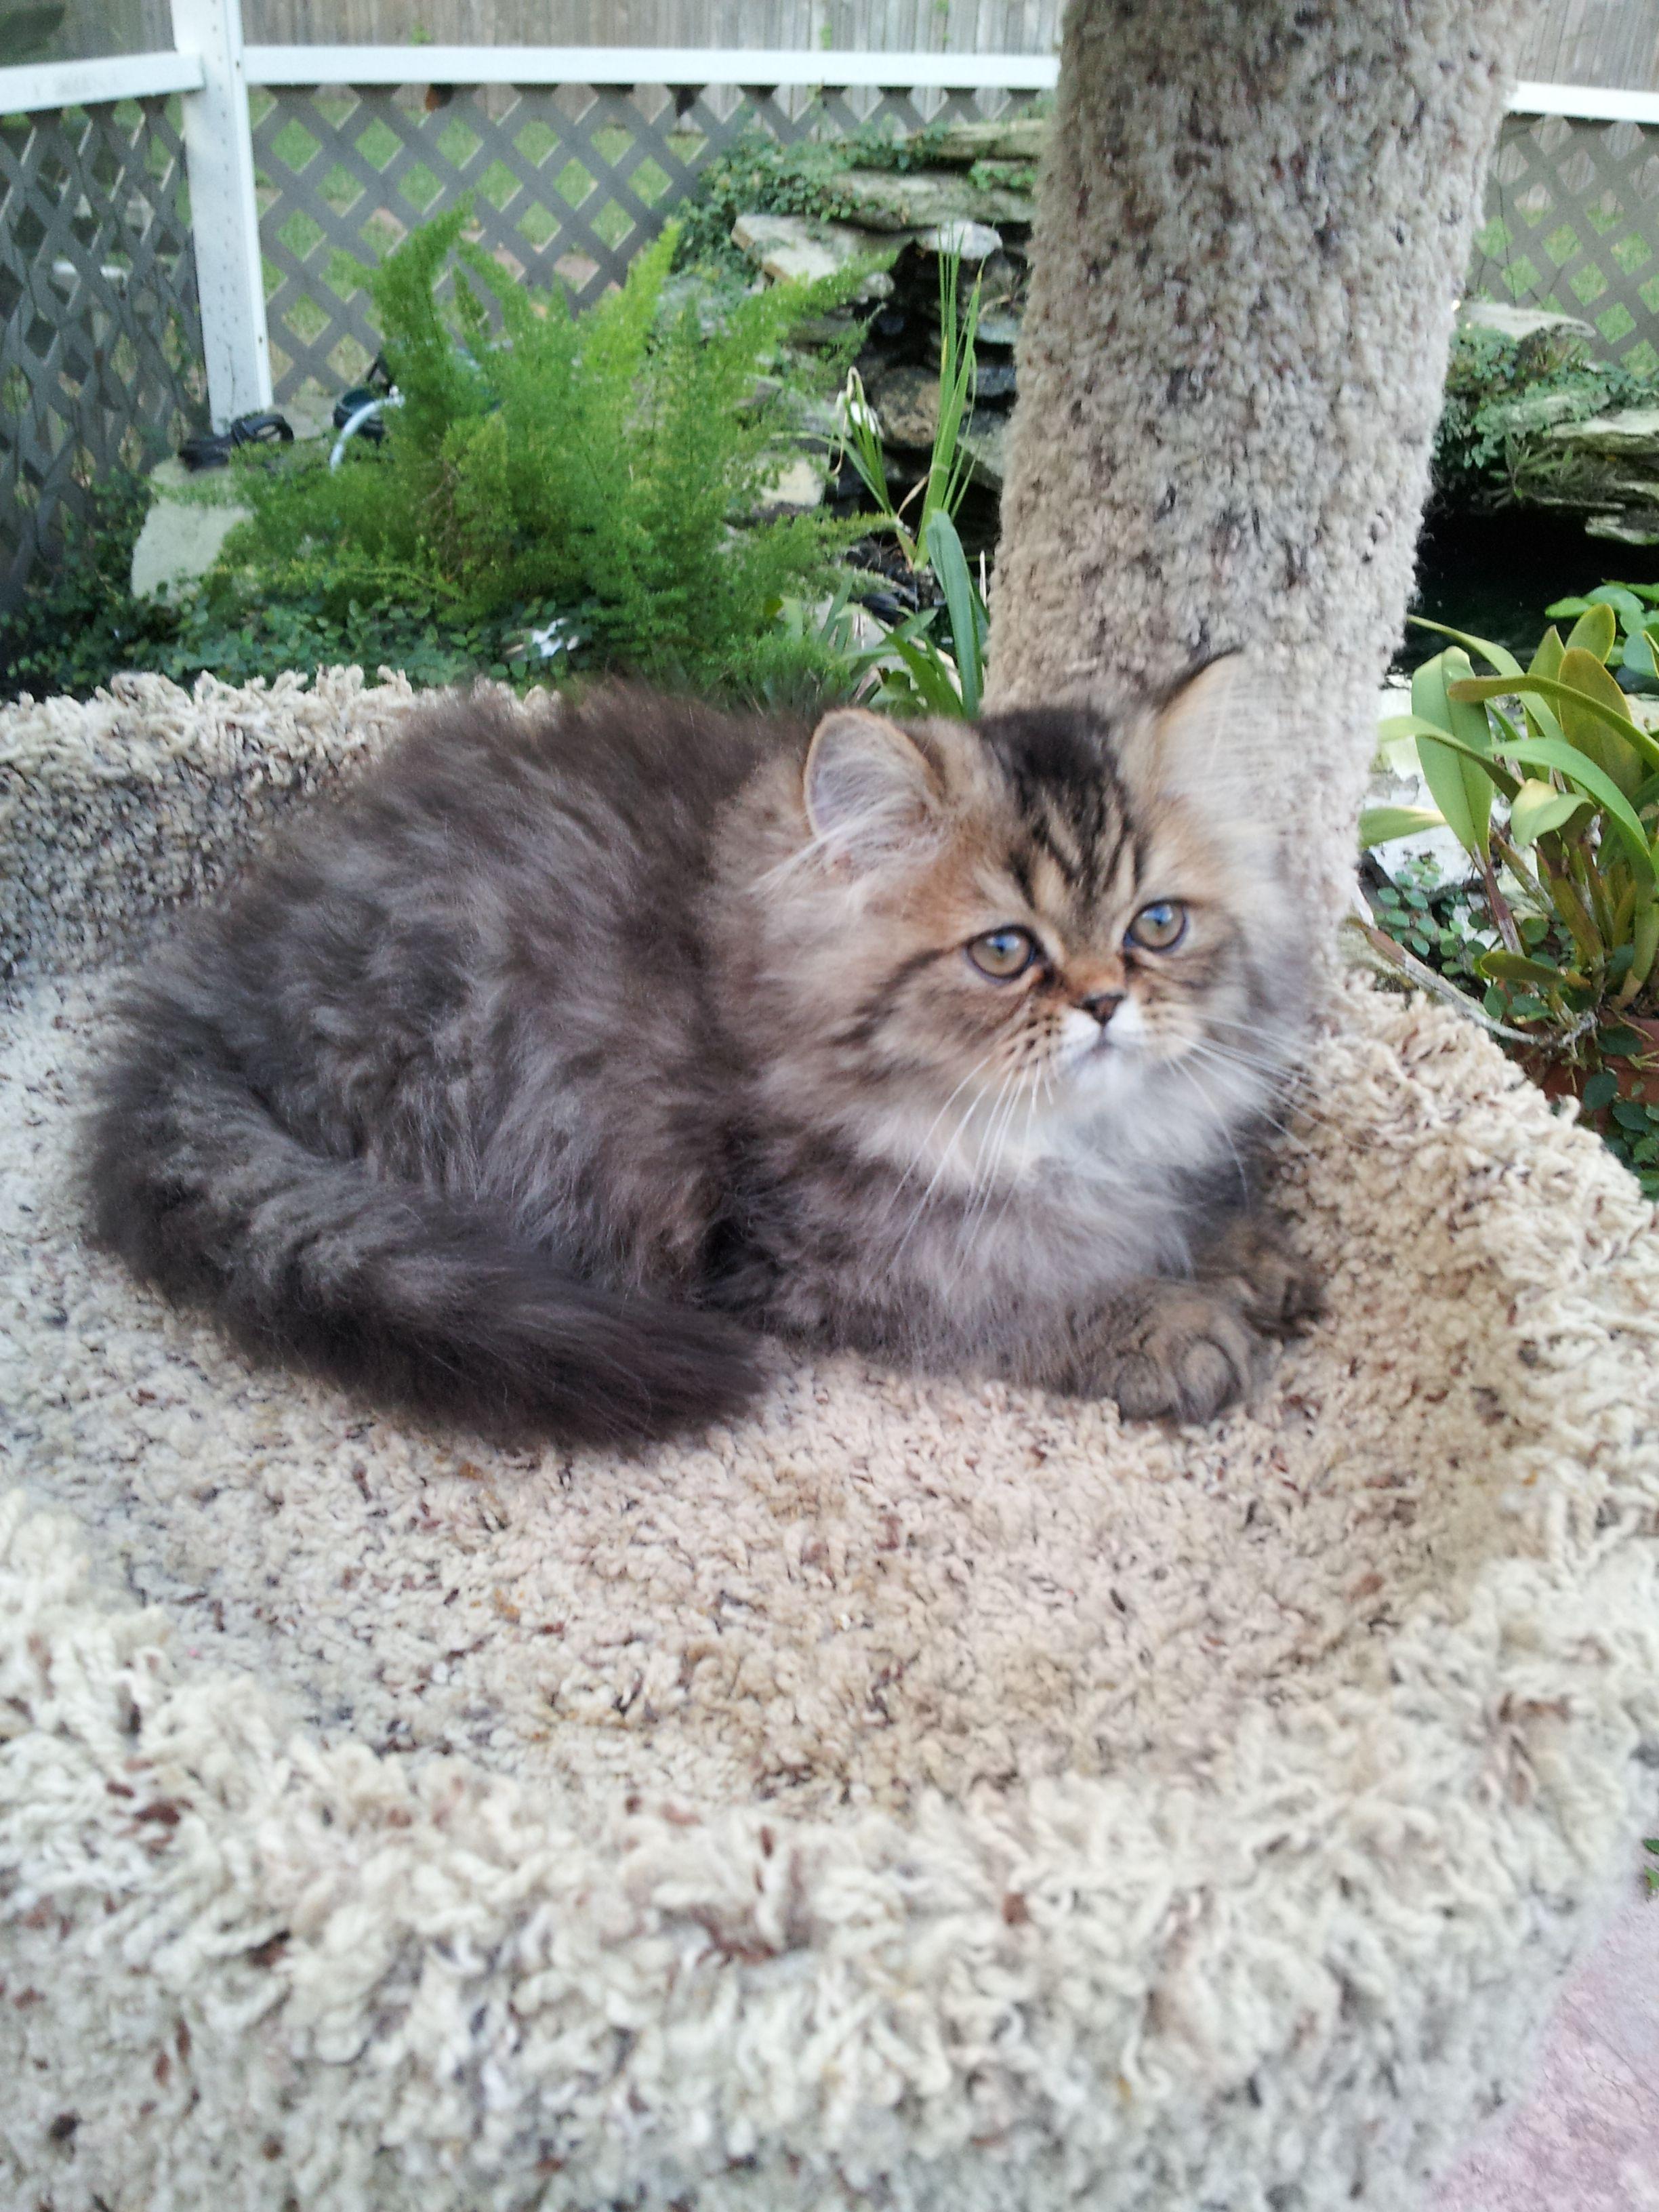 Brown Tabby Persian Kittens Pretty Cats Persian Kittens Kittens Cutest